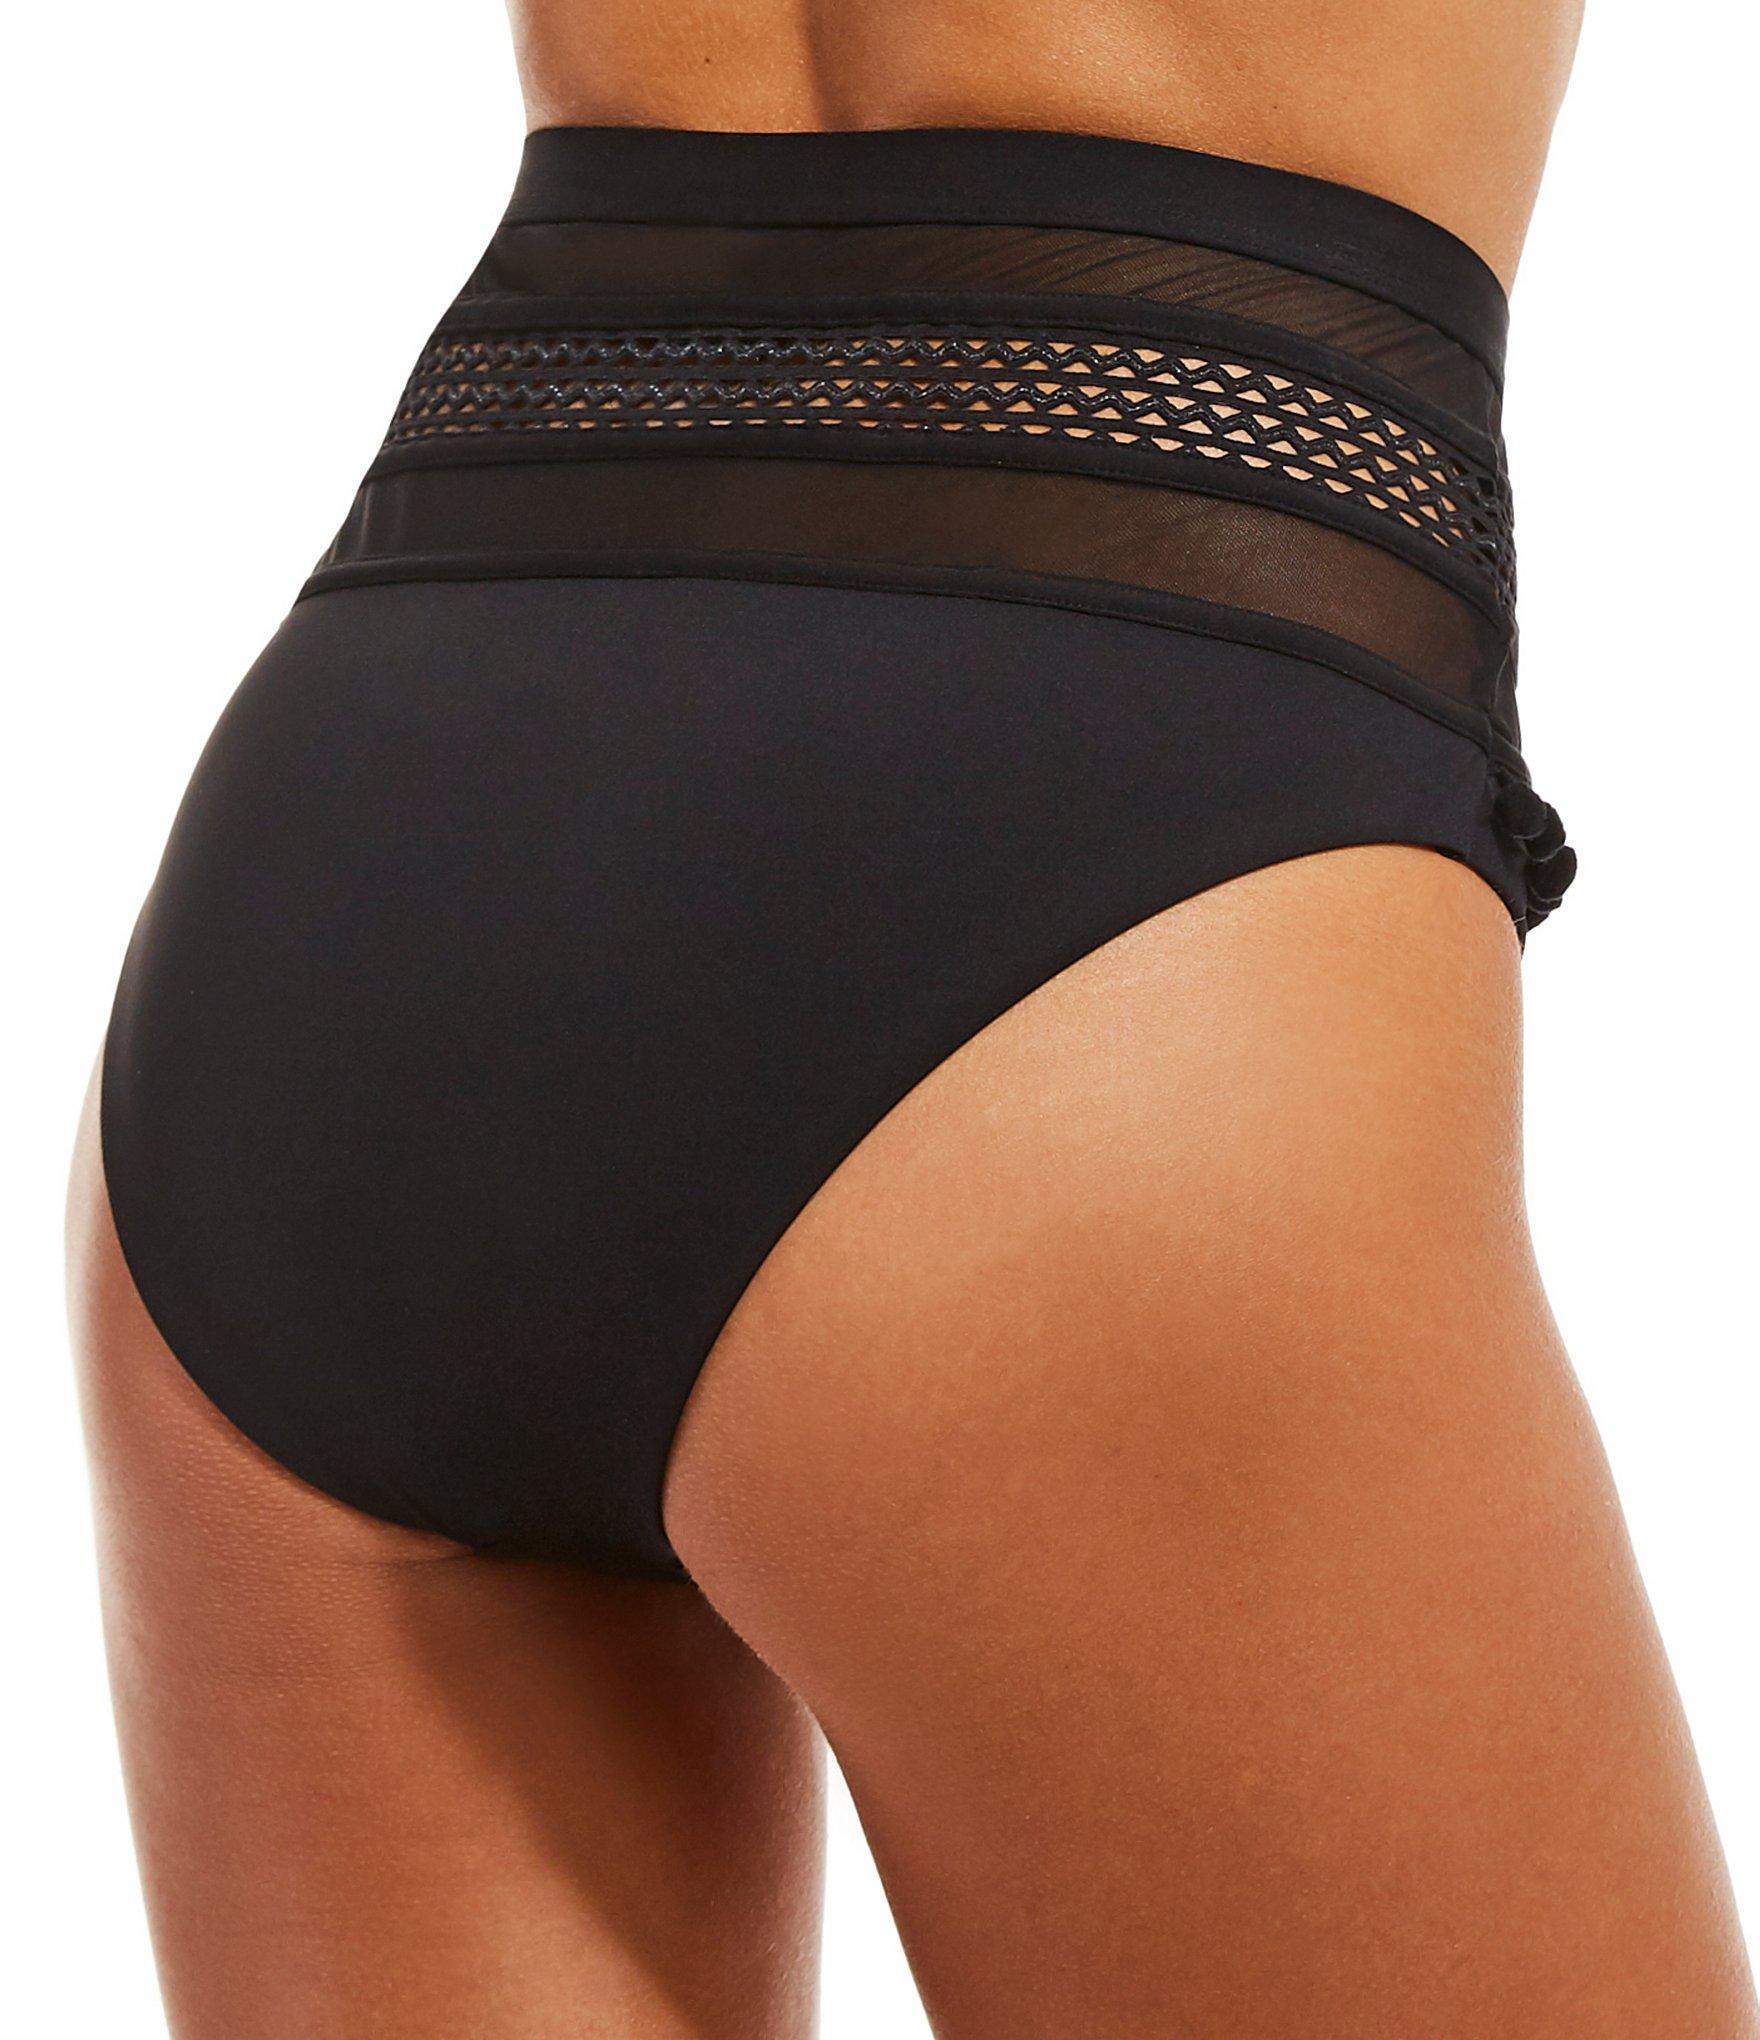 d226a0ed461bc Gianni Bini - Fan Fav Solid Black Hi-waist Pom Mesh Swimsuit Bottoms - Lyst.  View fullscreen